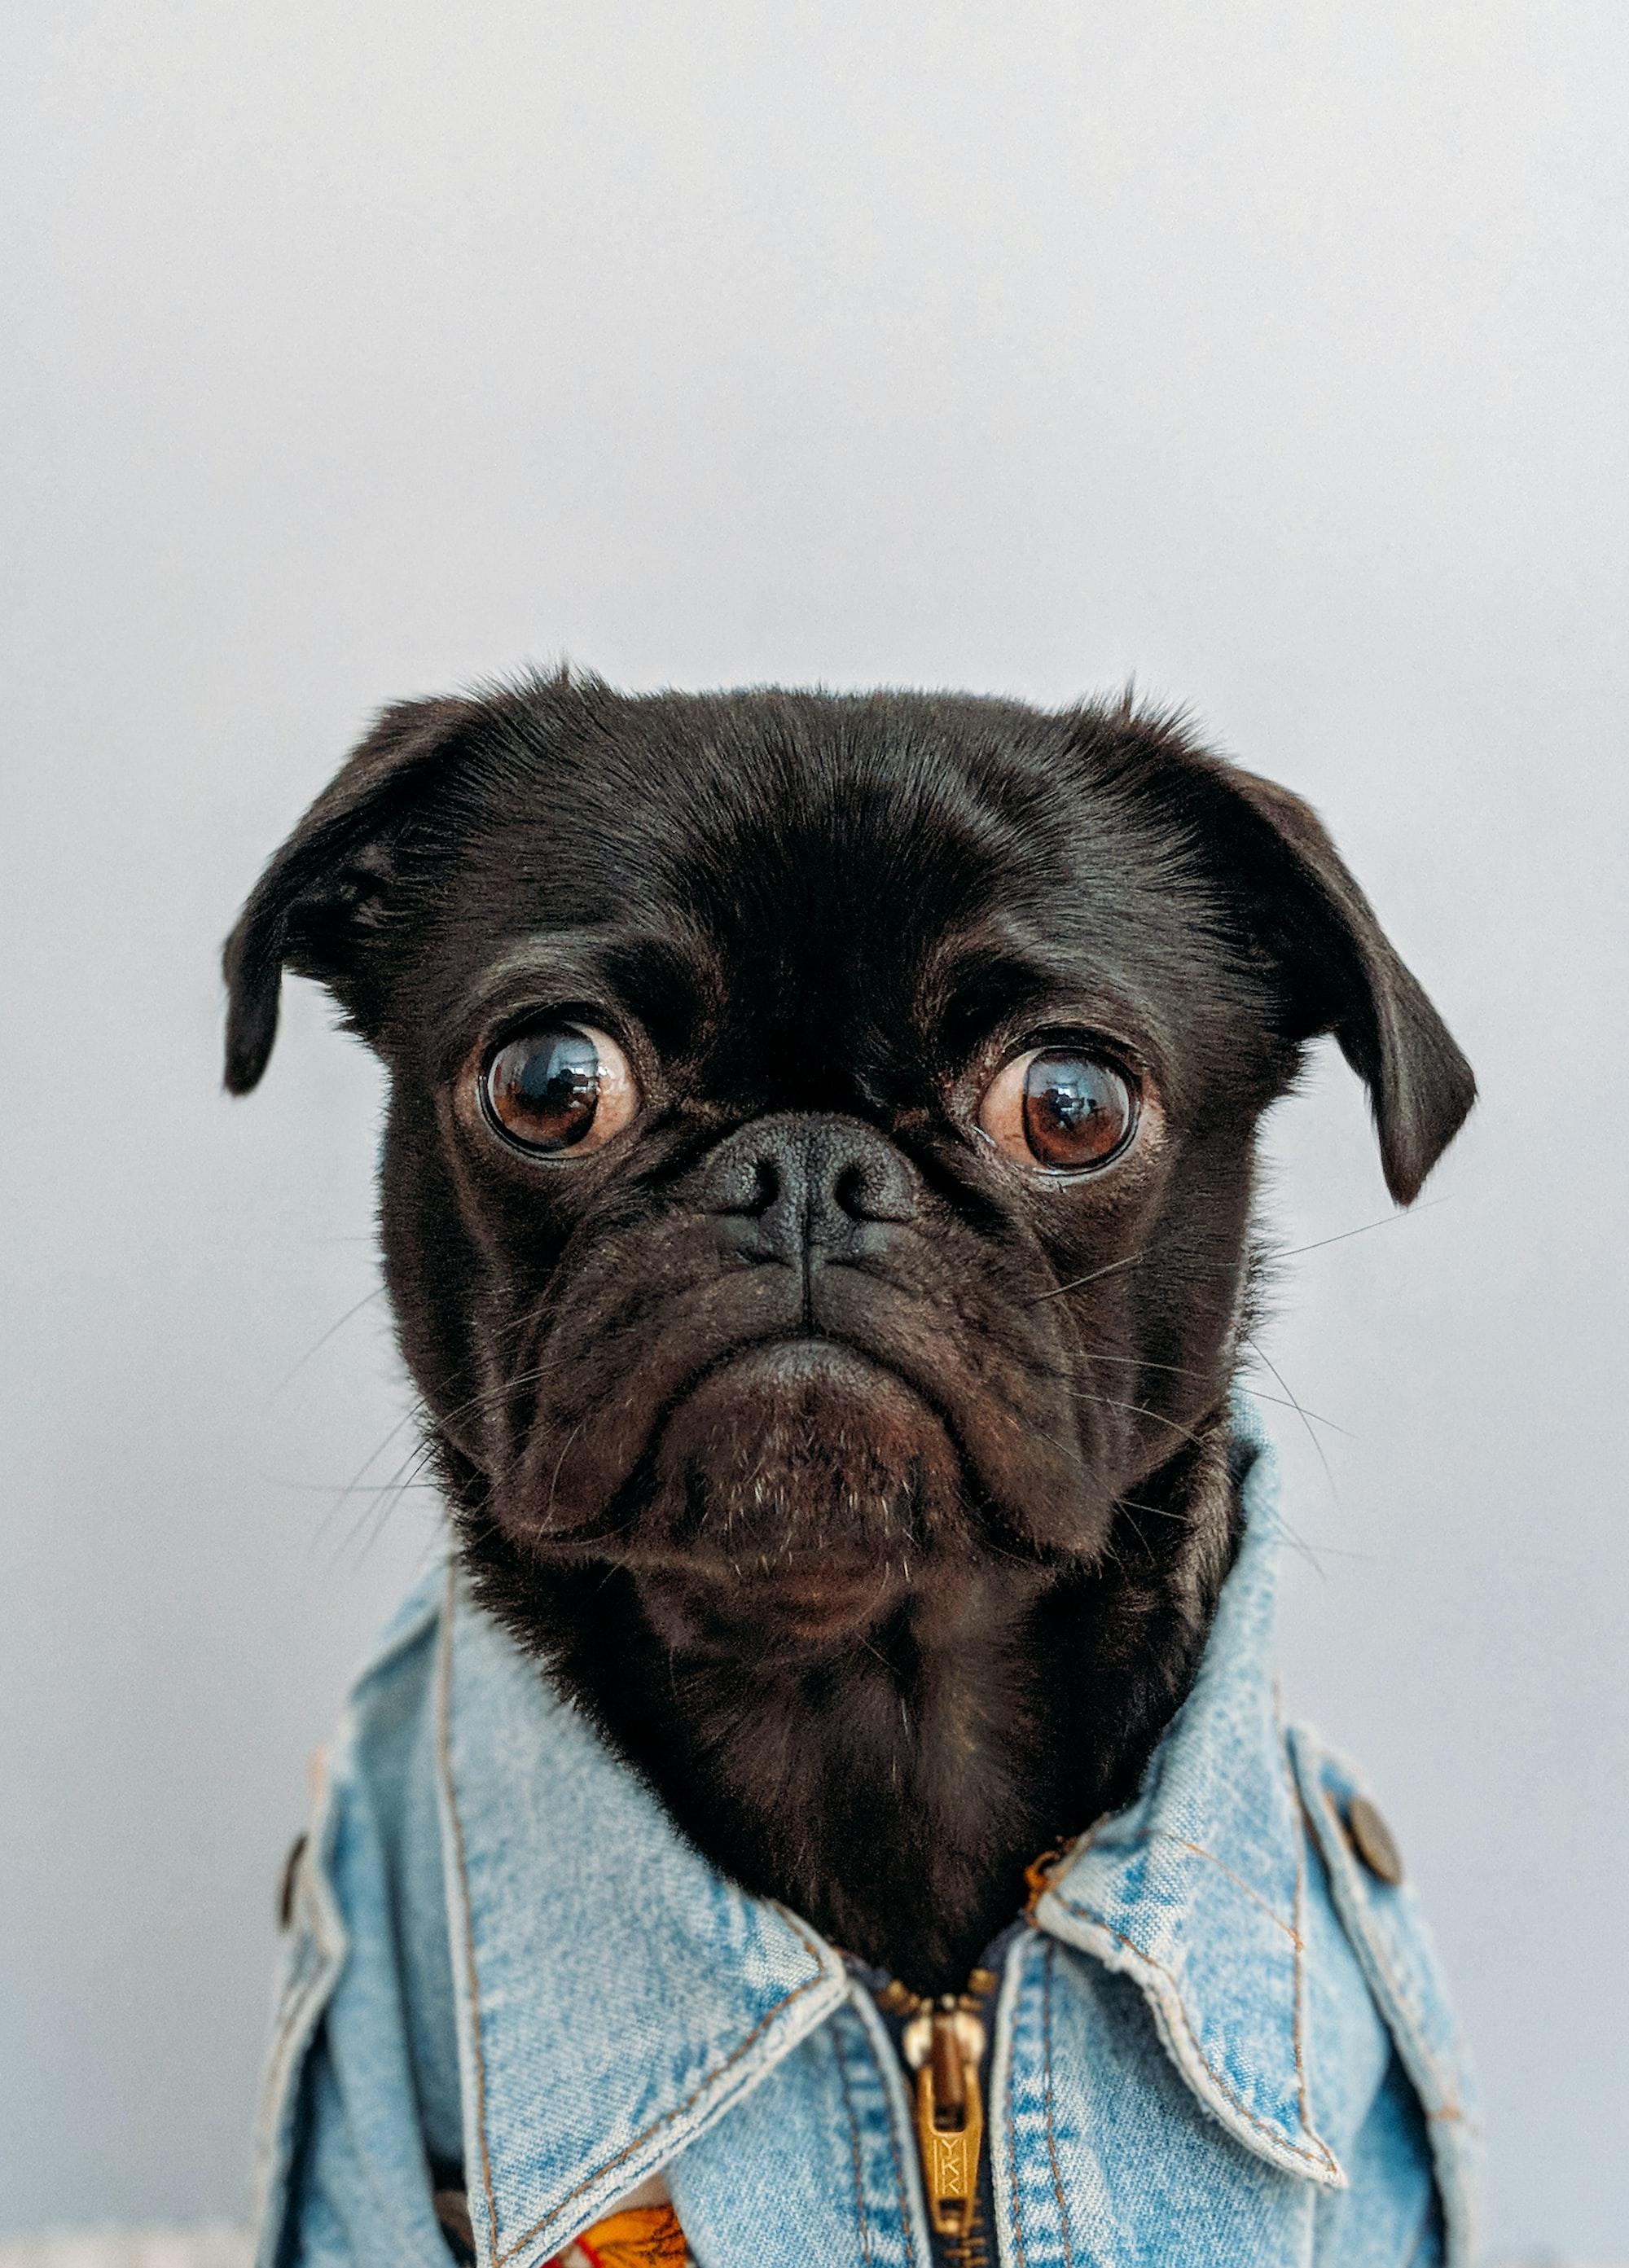 Toshi (black pug) wearing my pilot jacket.